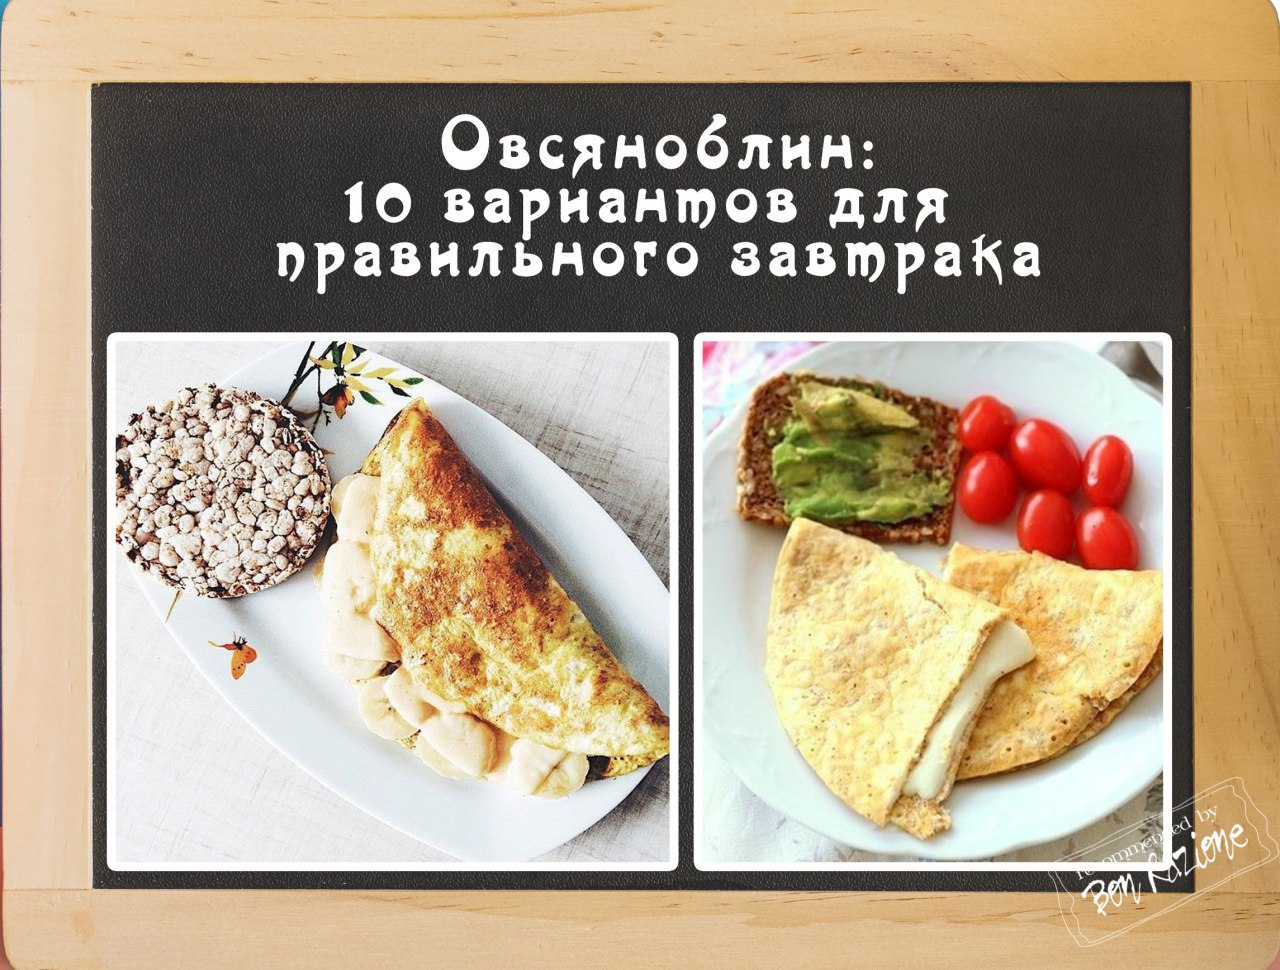 Овсяноблин на завтрак: 10 пп-рецептов + 15 начинок